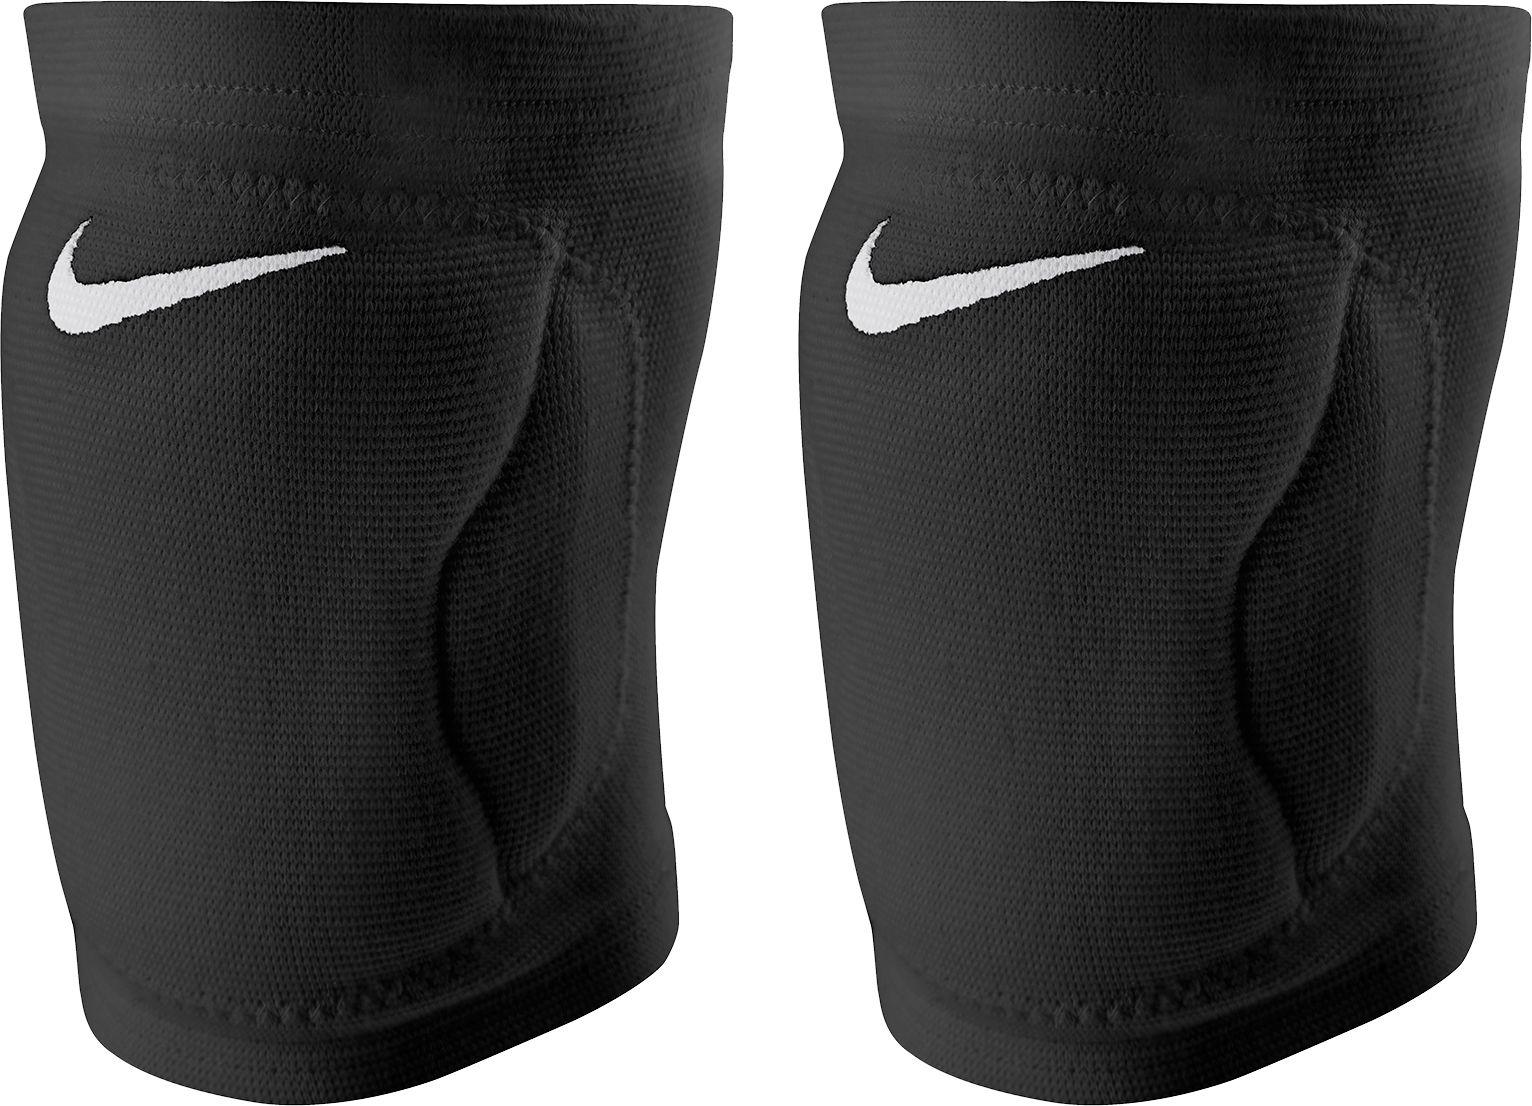 Nike Streak Volleyball Knee Pads Dicks Sporting Goods